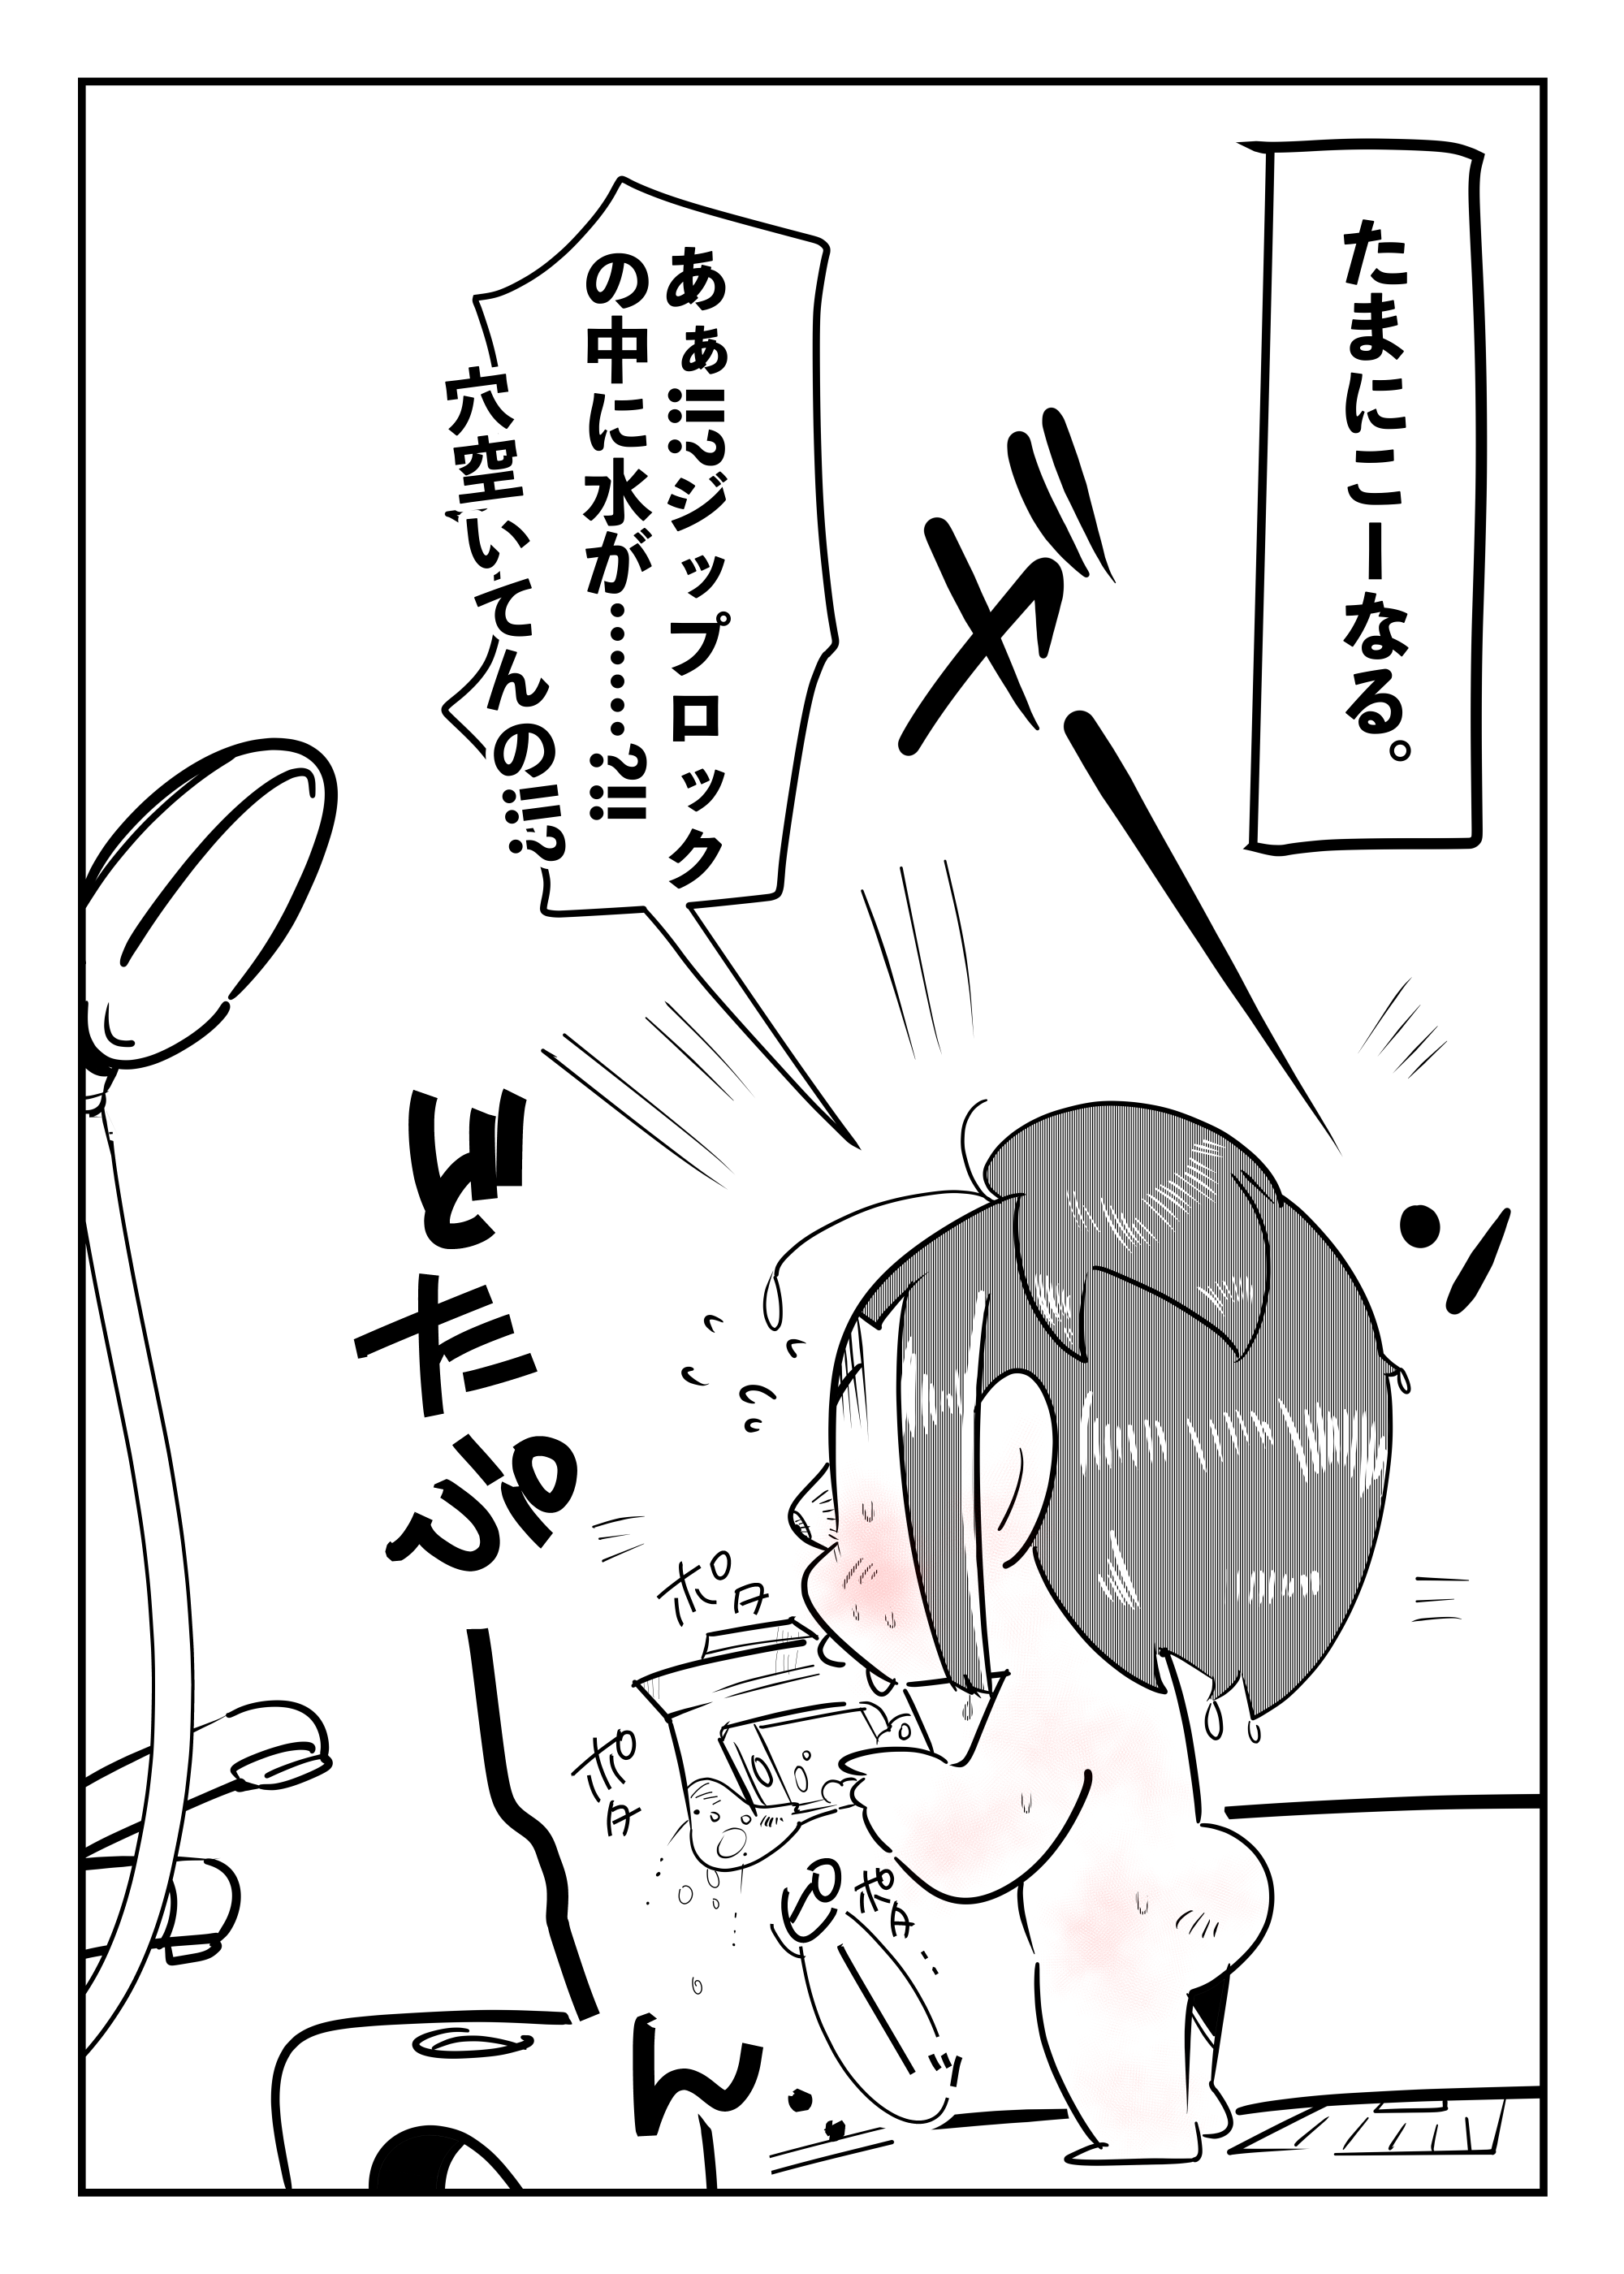 f:id:terashimaru117:20211009142436p:plain